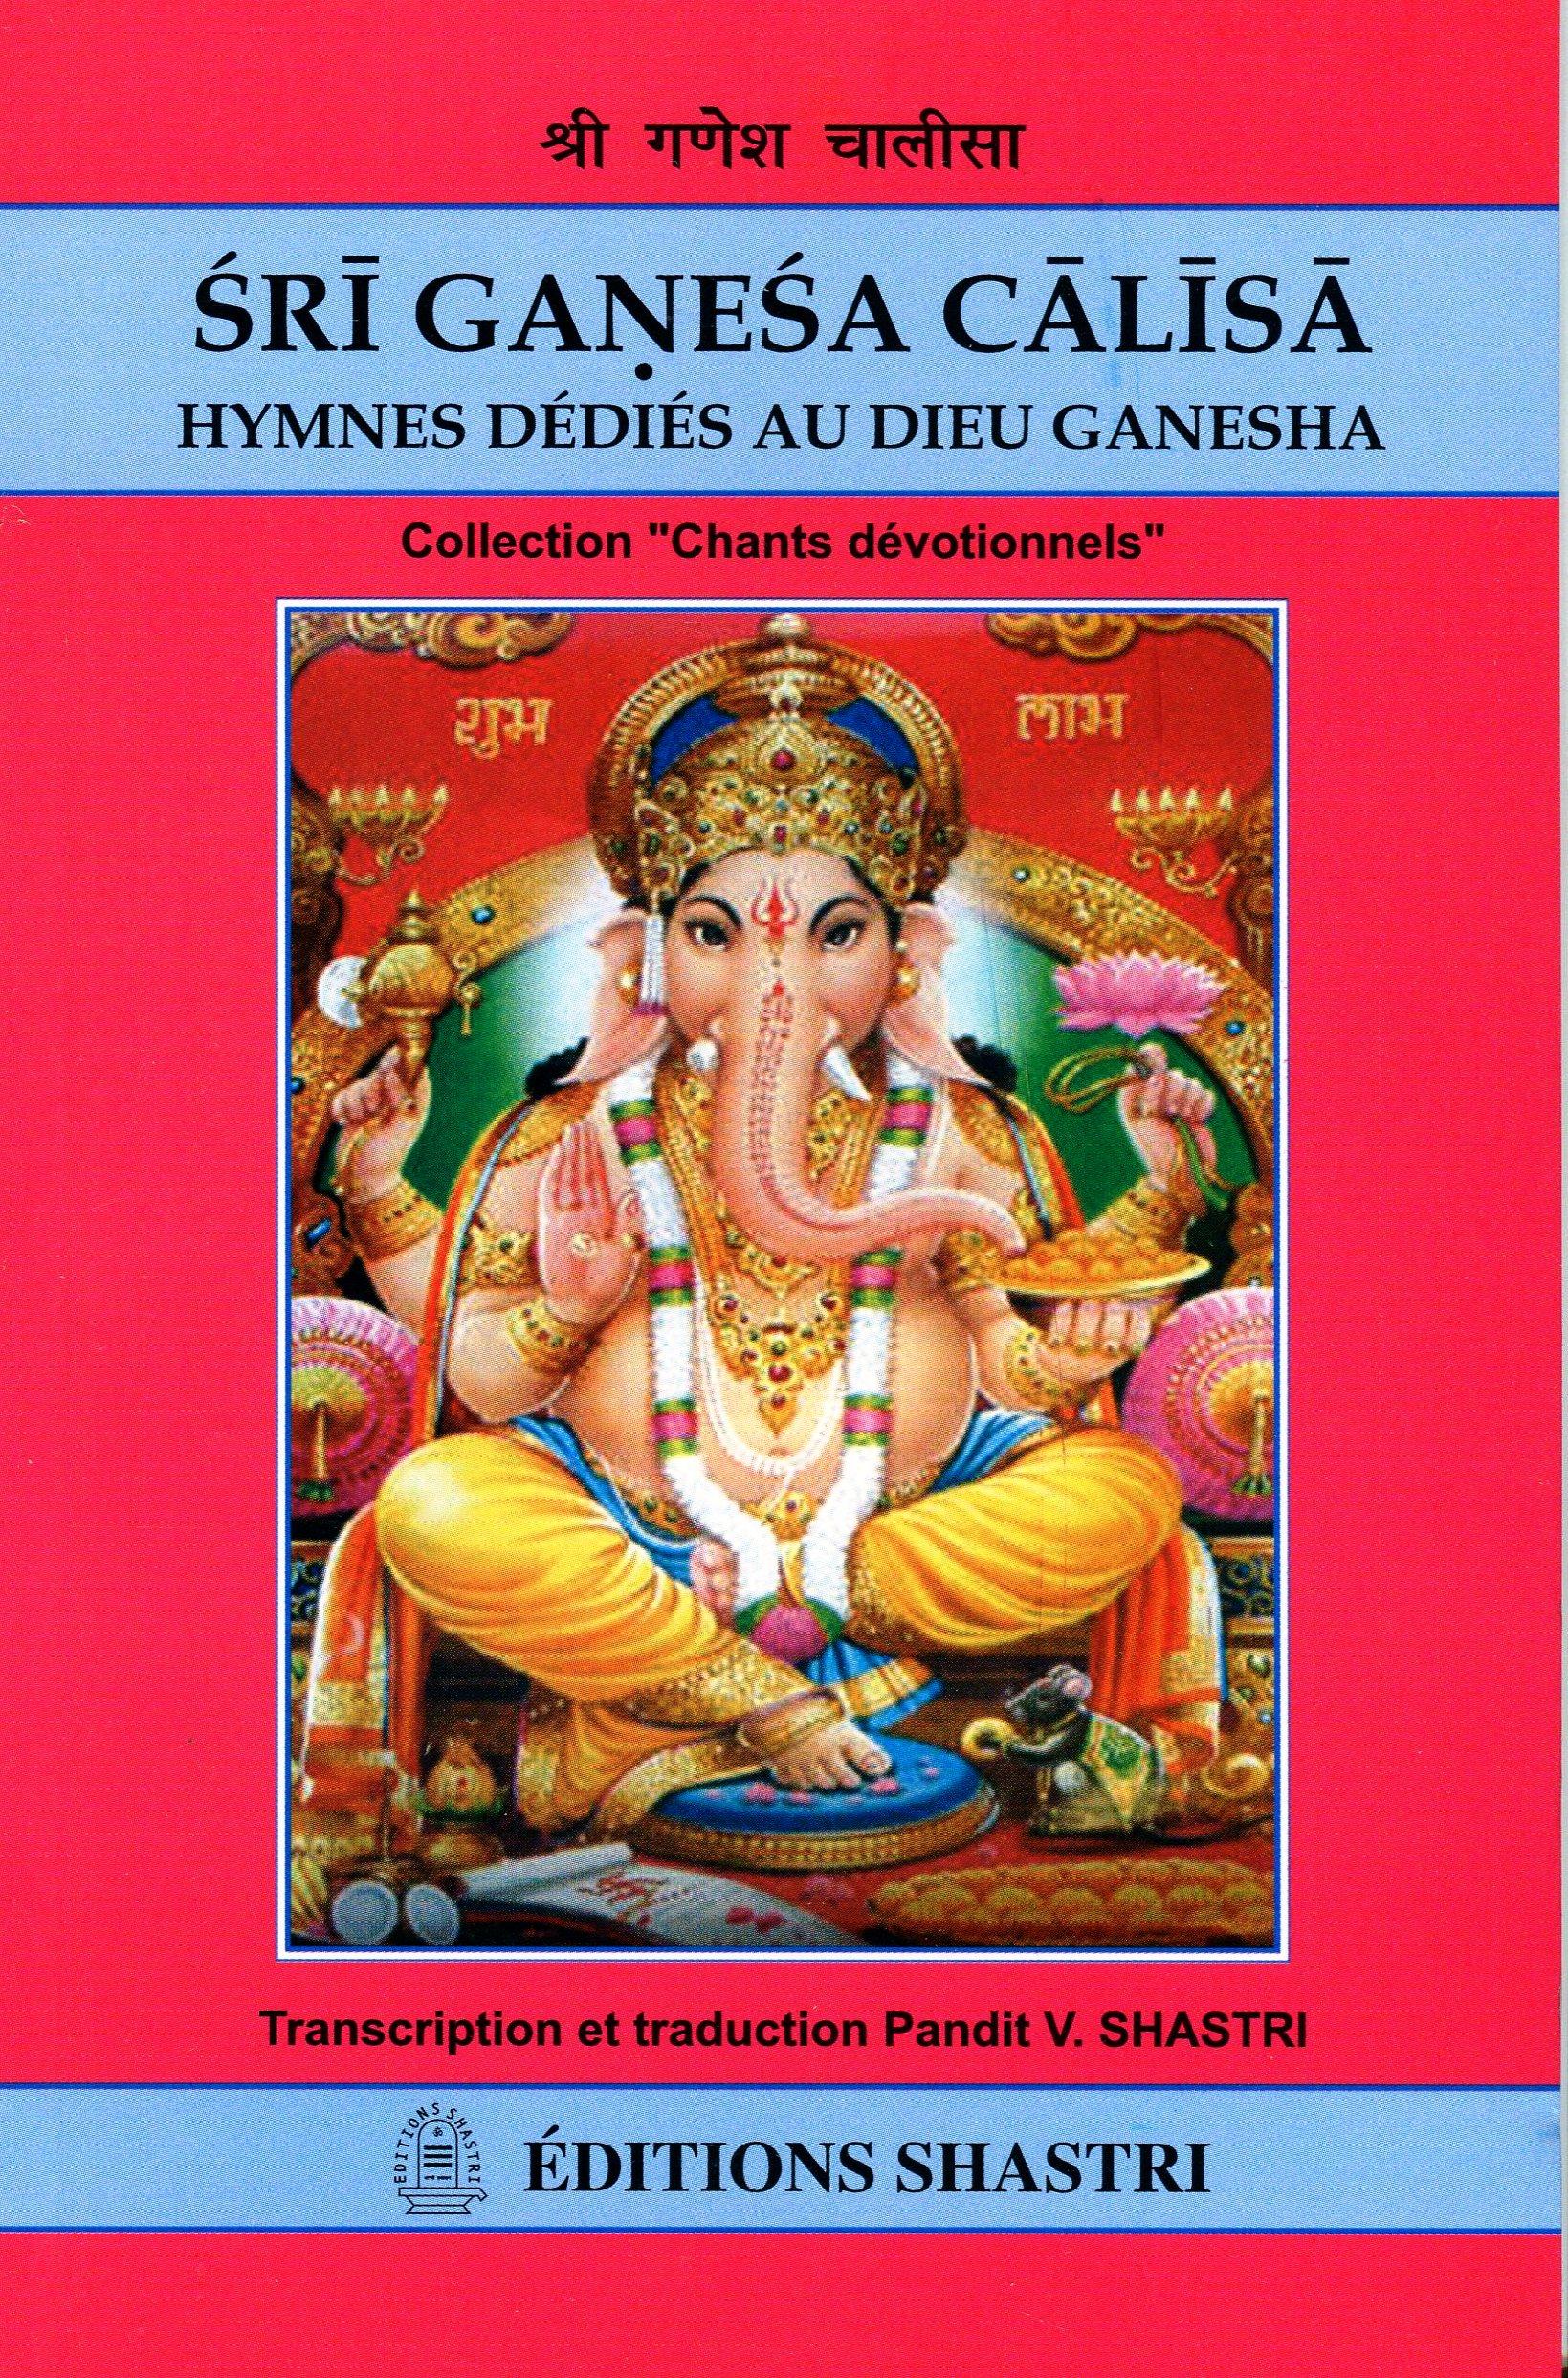 img397 Ganesha Calisa 1ère p couverture